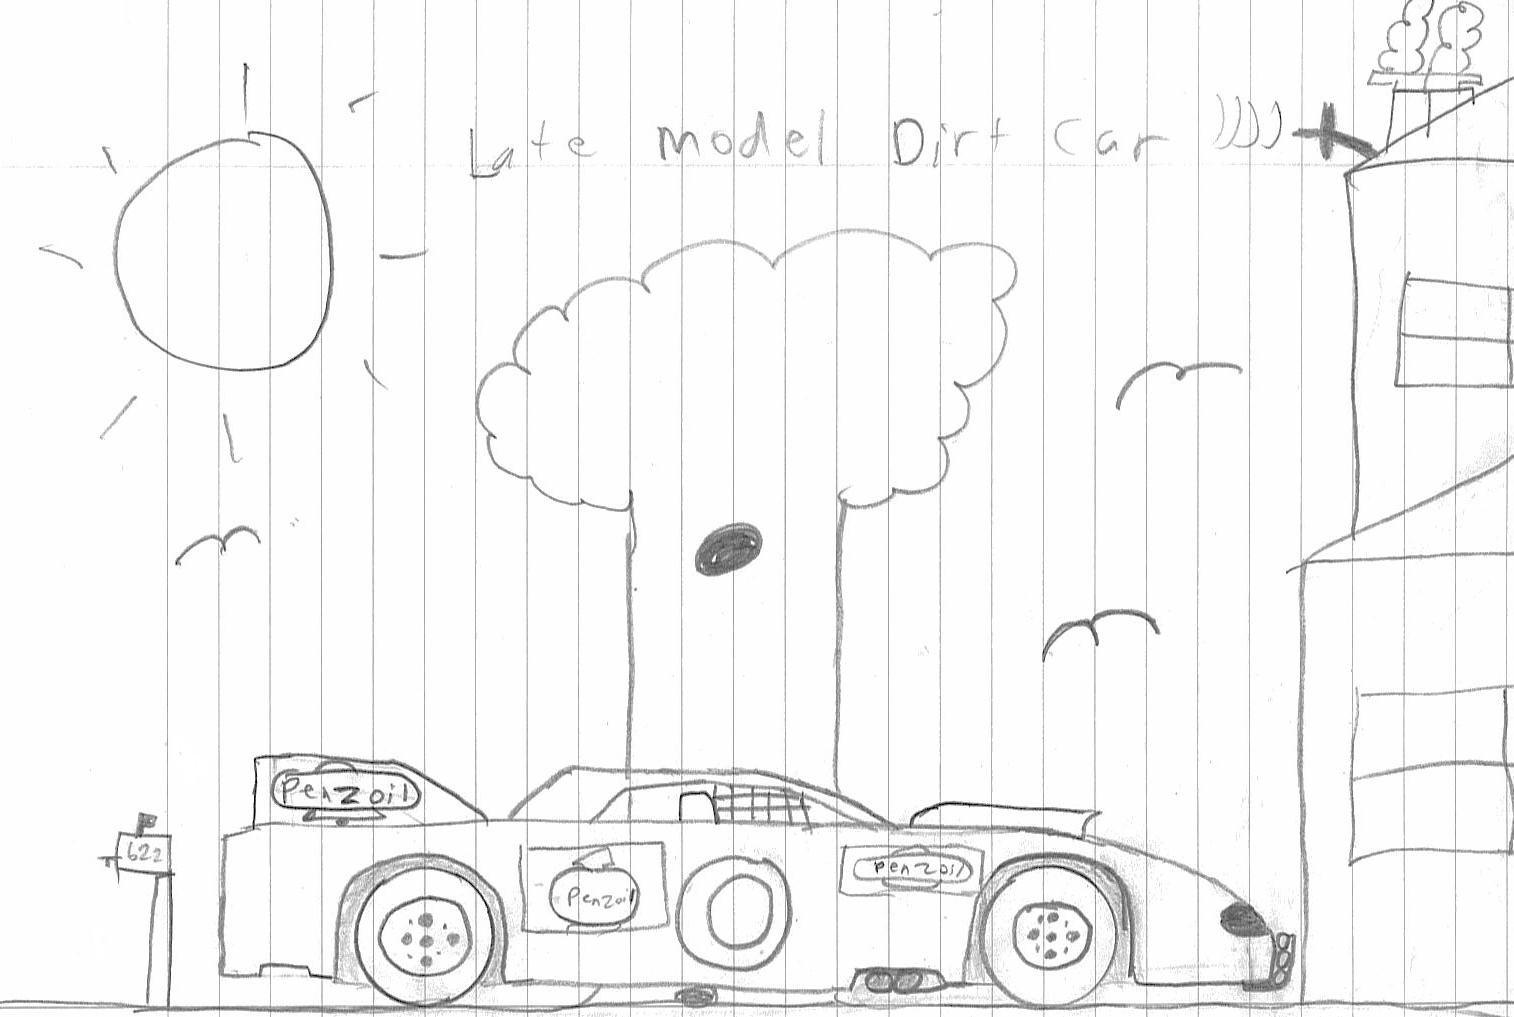 1514x1017 Late Model Dirt Car By K1092000